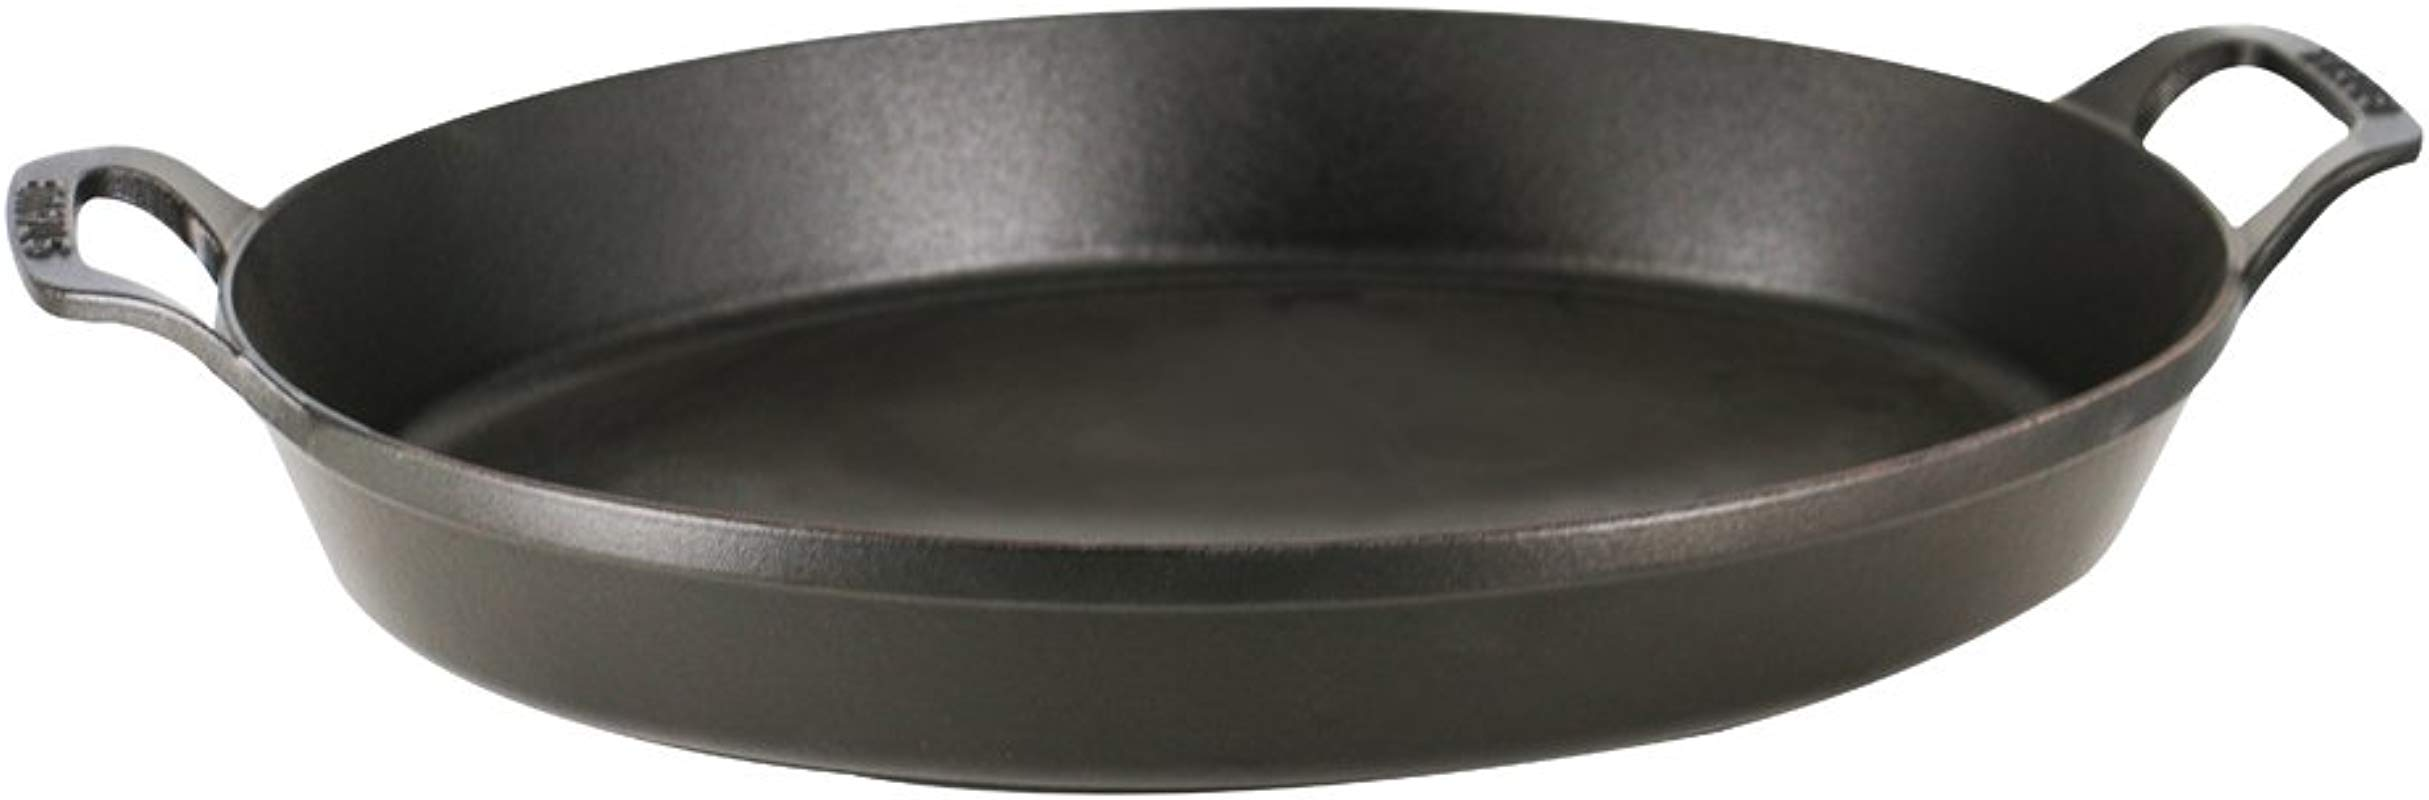 Staub 13003725 Cast Iron Oval Baking Dish 14 5x11 2 Inch Matte Black